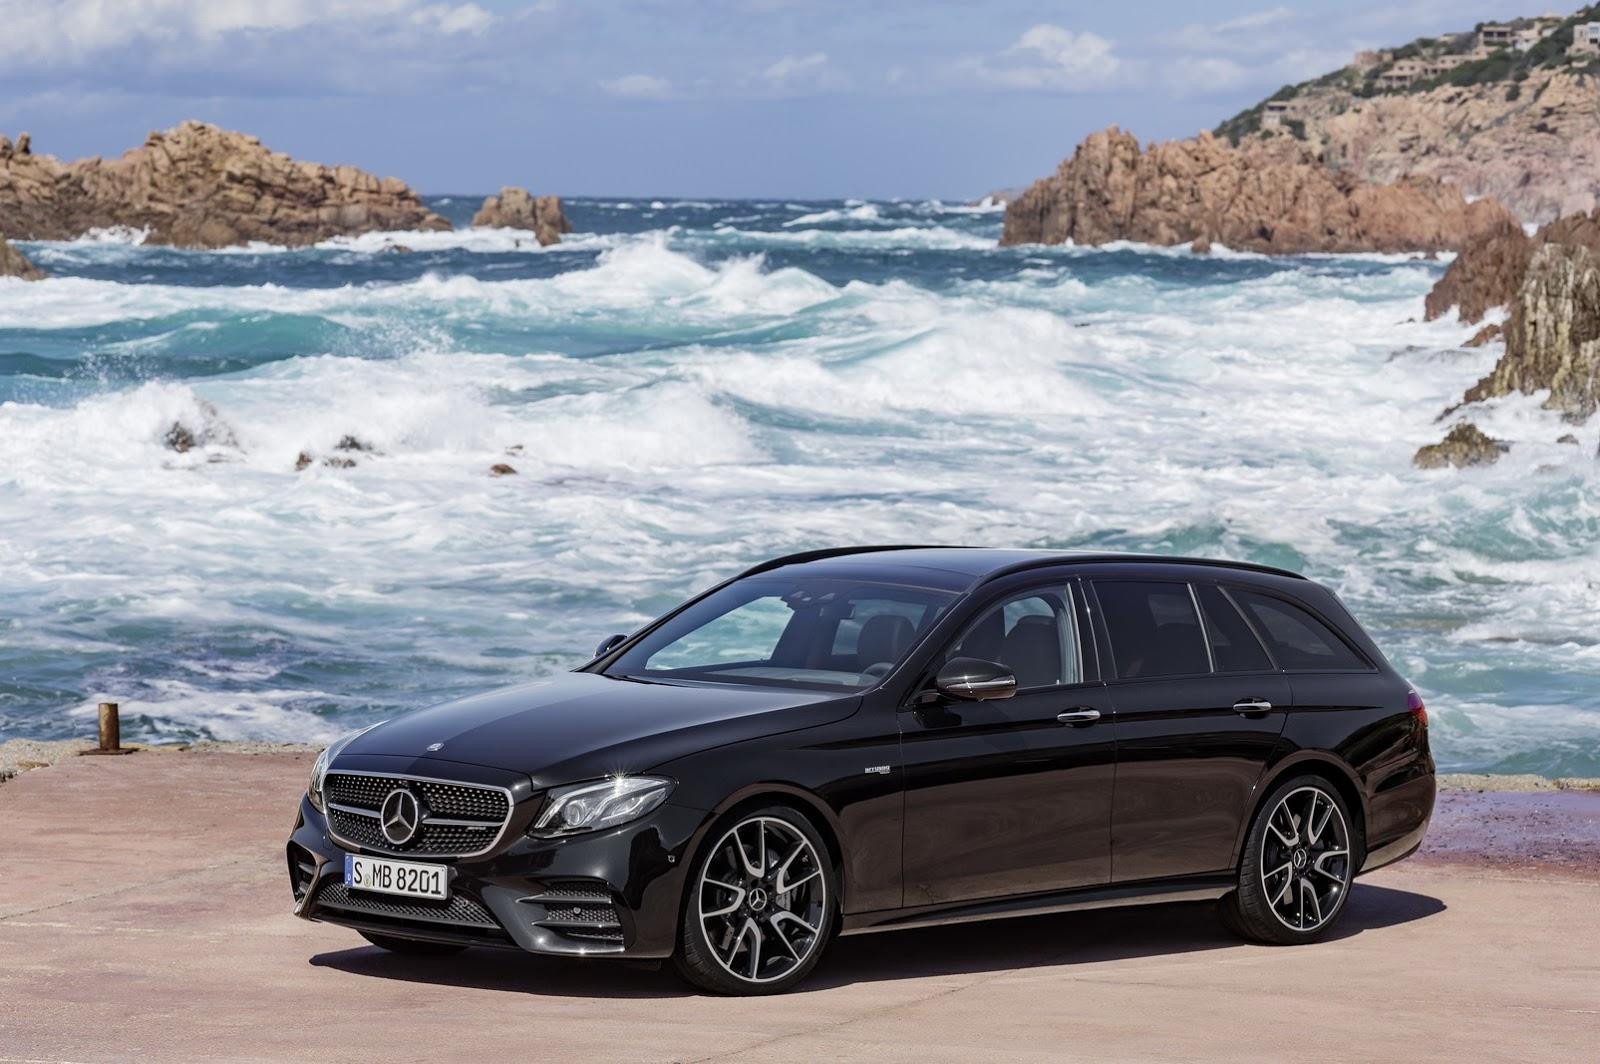 All Types mercedes e class estate 2010 : VWVortex.com - 2017 W213 Mercedes-Benz E-Class Estate lineup ...